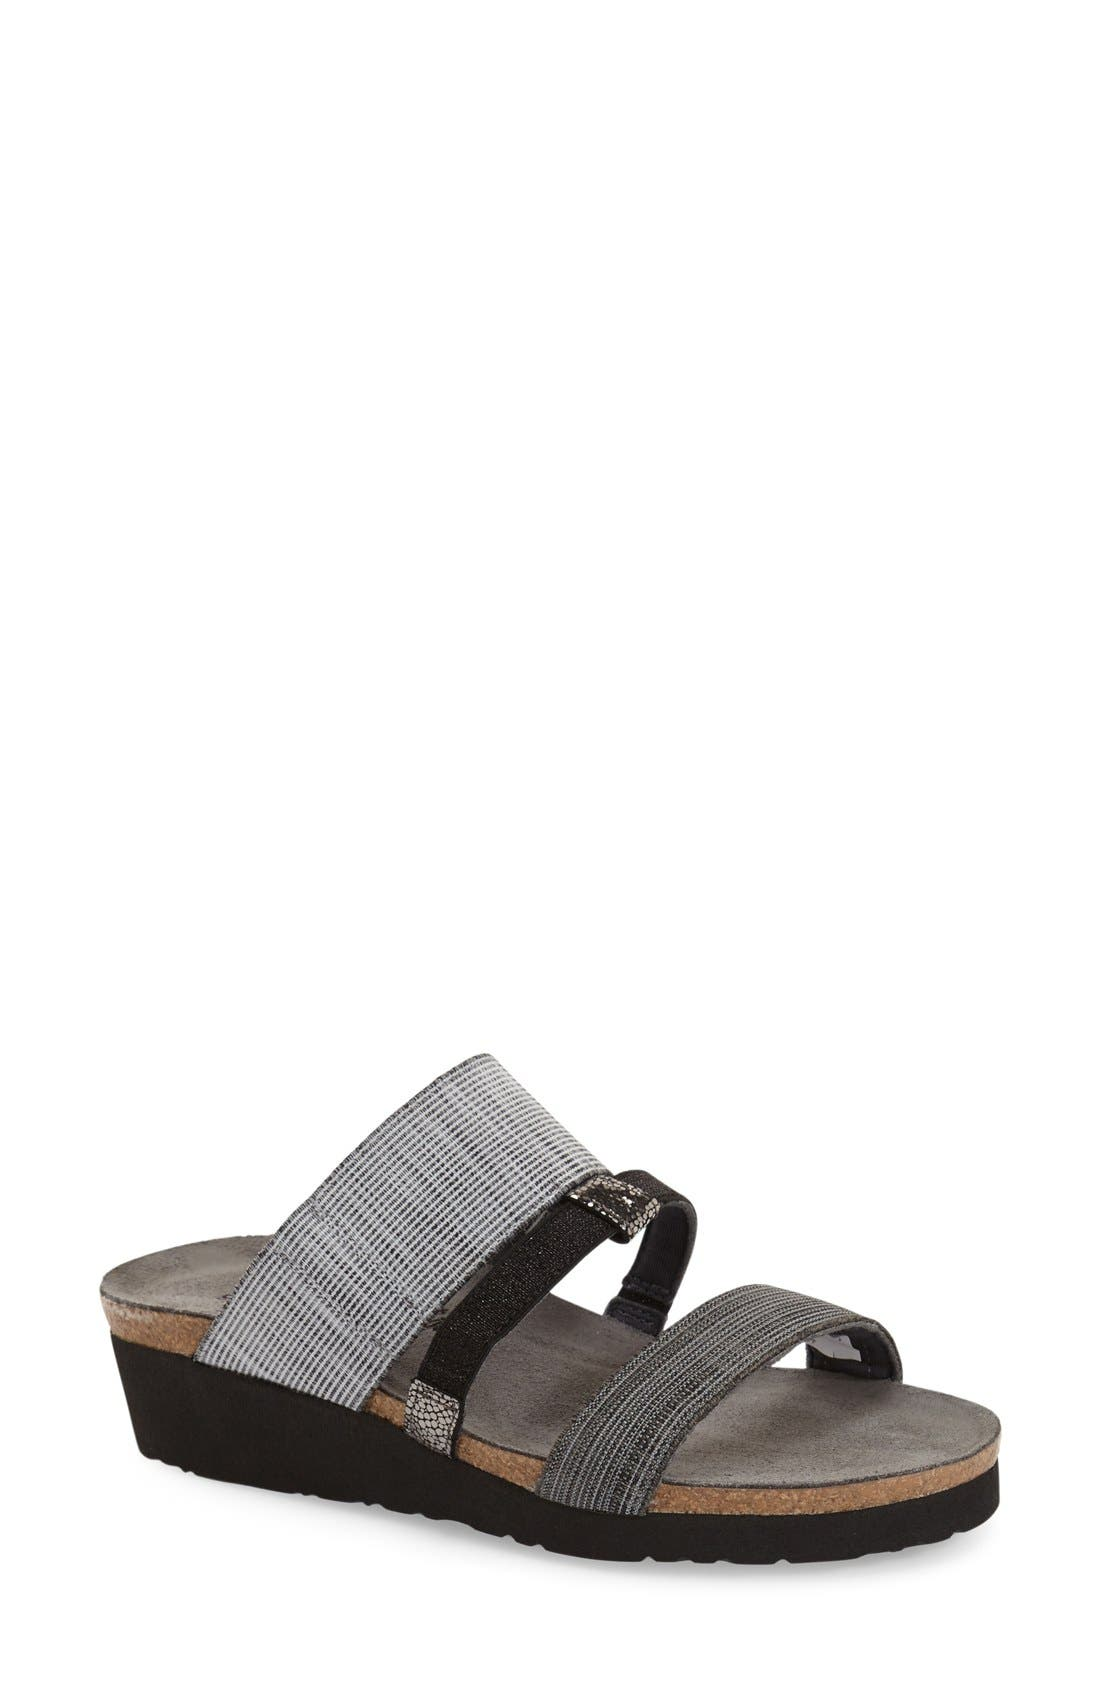 'Brenda' Slip-On Sandal,                         Main,                         color, Grey/ Black Leather Fabric